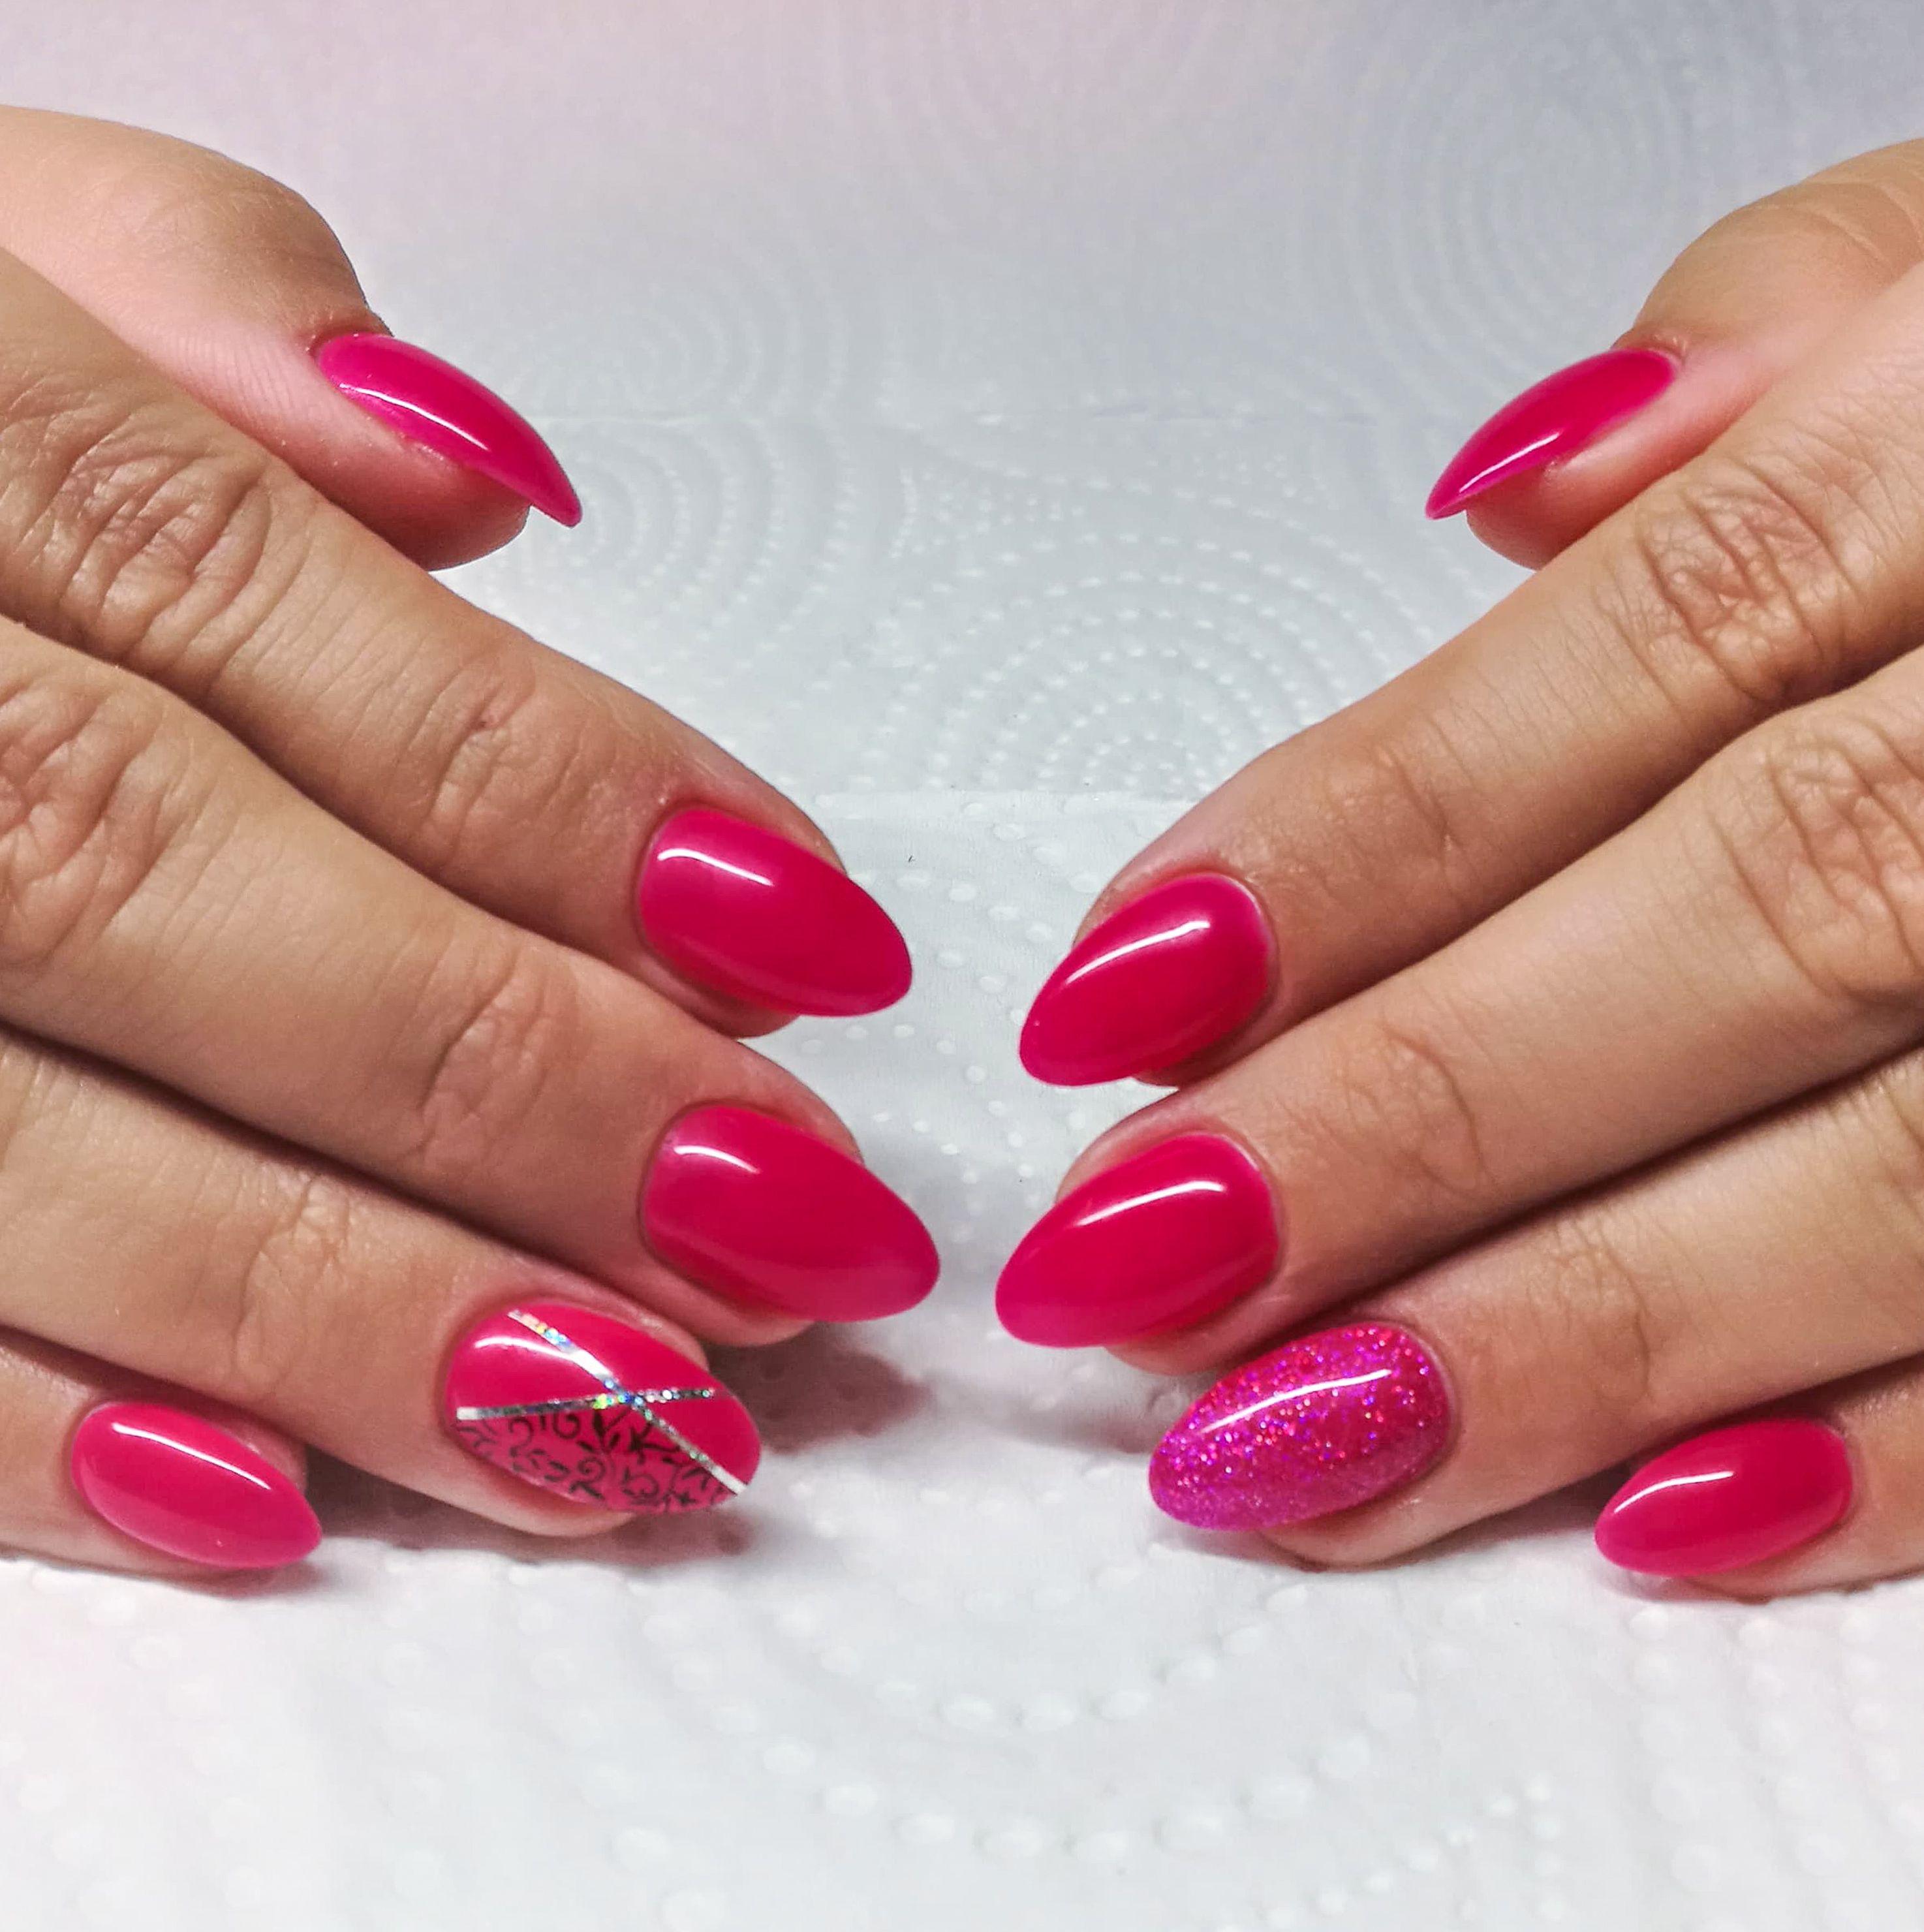 Vecne Krasna Cervena 3 Takove Nehty Muzete Mit I Vy S Naninails Gel Laky Gorgeous Red Manicure Even Your Nails Can Look Like Th Nehet Nehty Lak